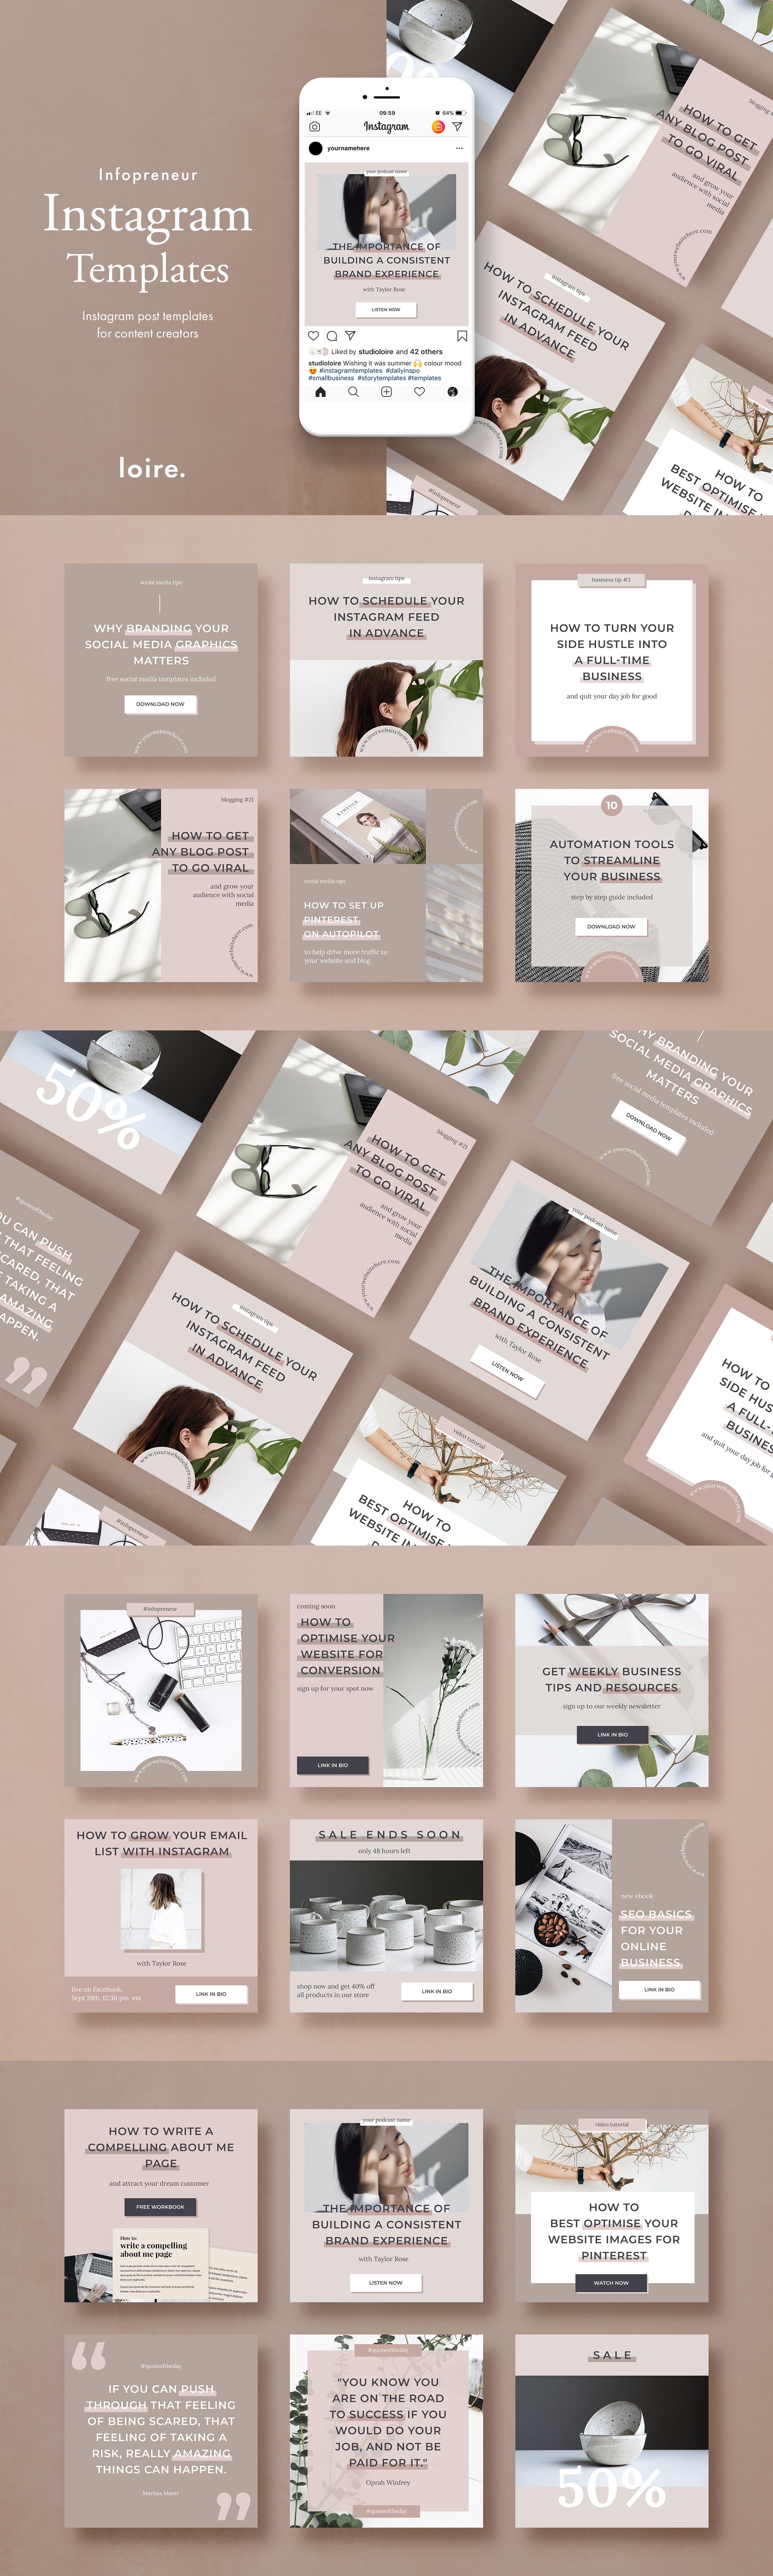 Instagram marketing bundle for bloggers example image 2